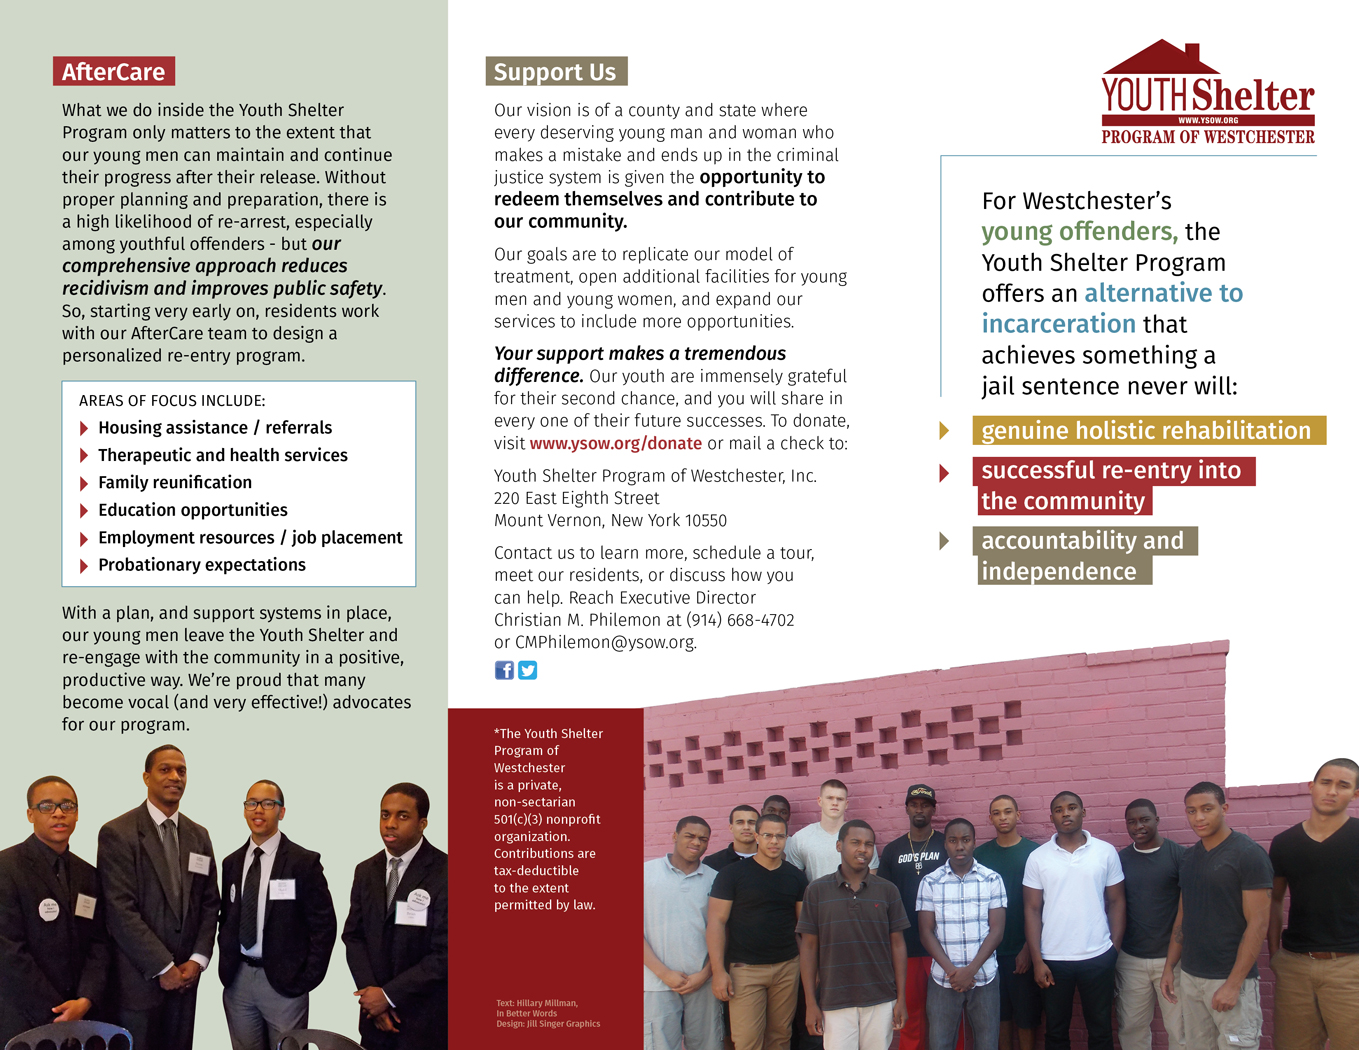 Youth Shelter Program of Westchester